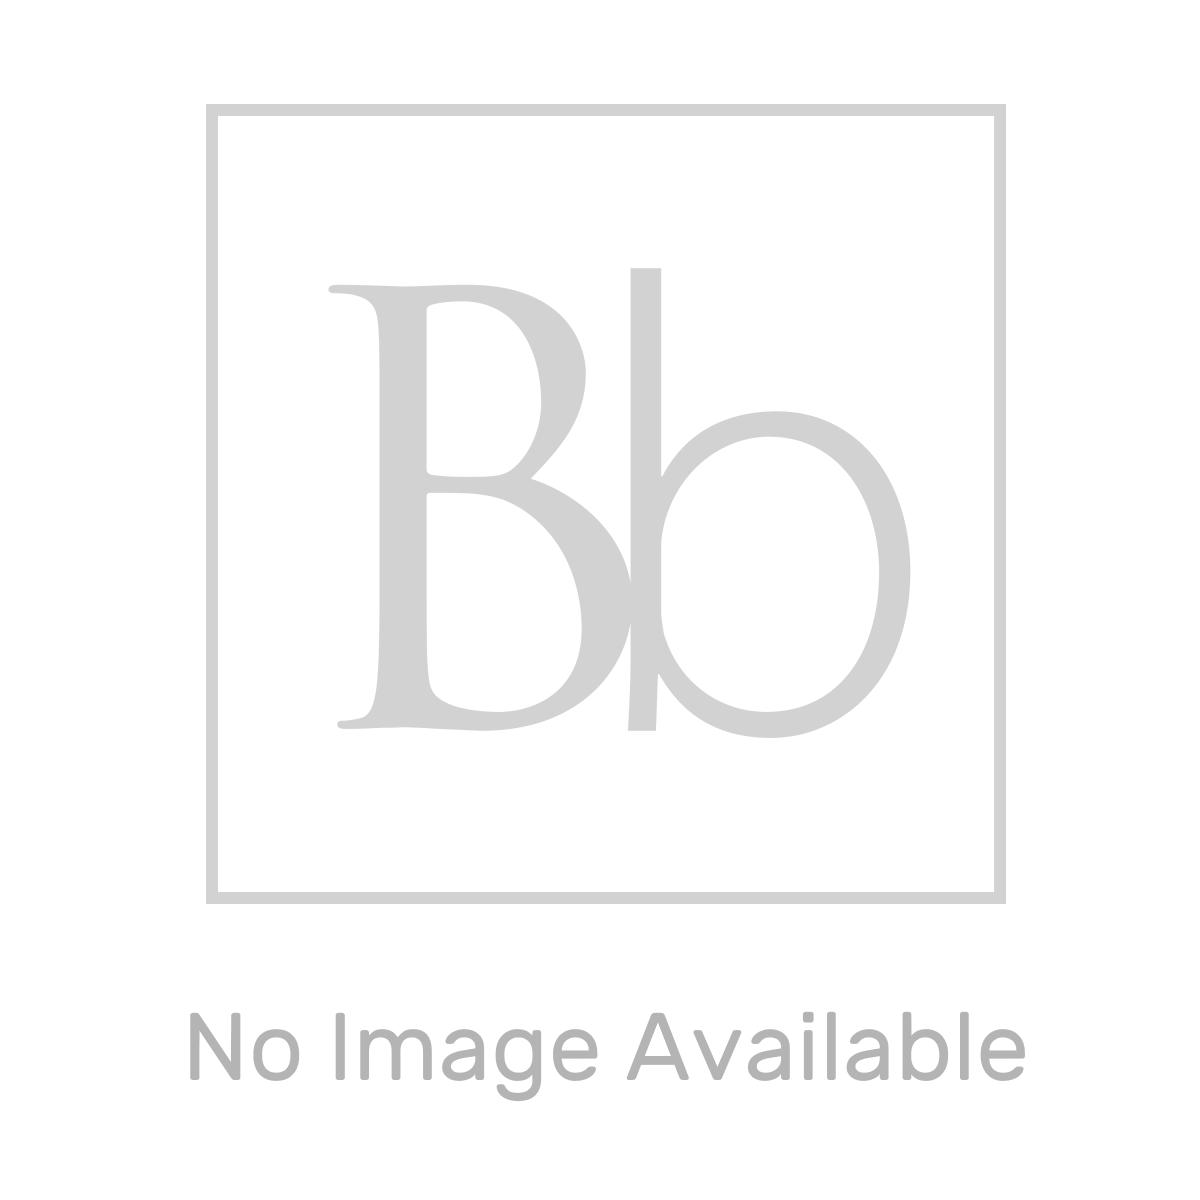 Old London Twilight Blue End Bath Panel 700mm